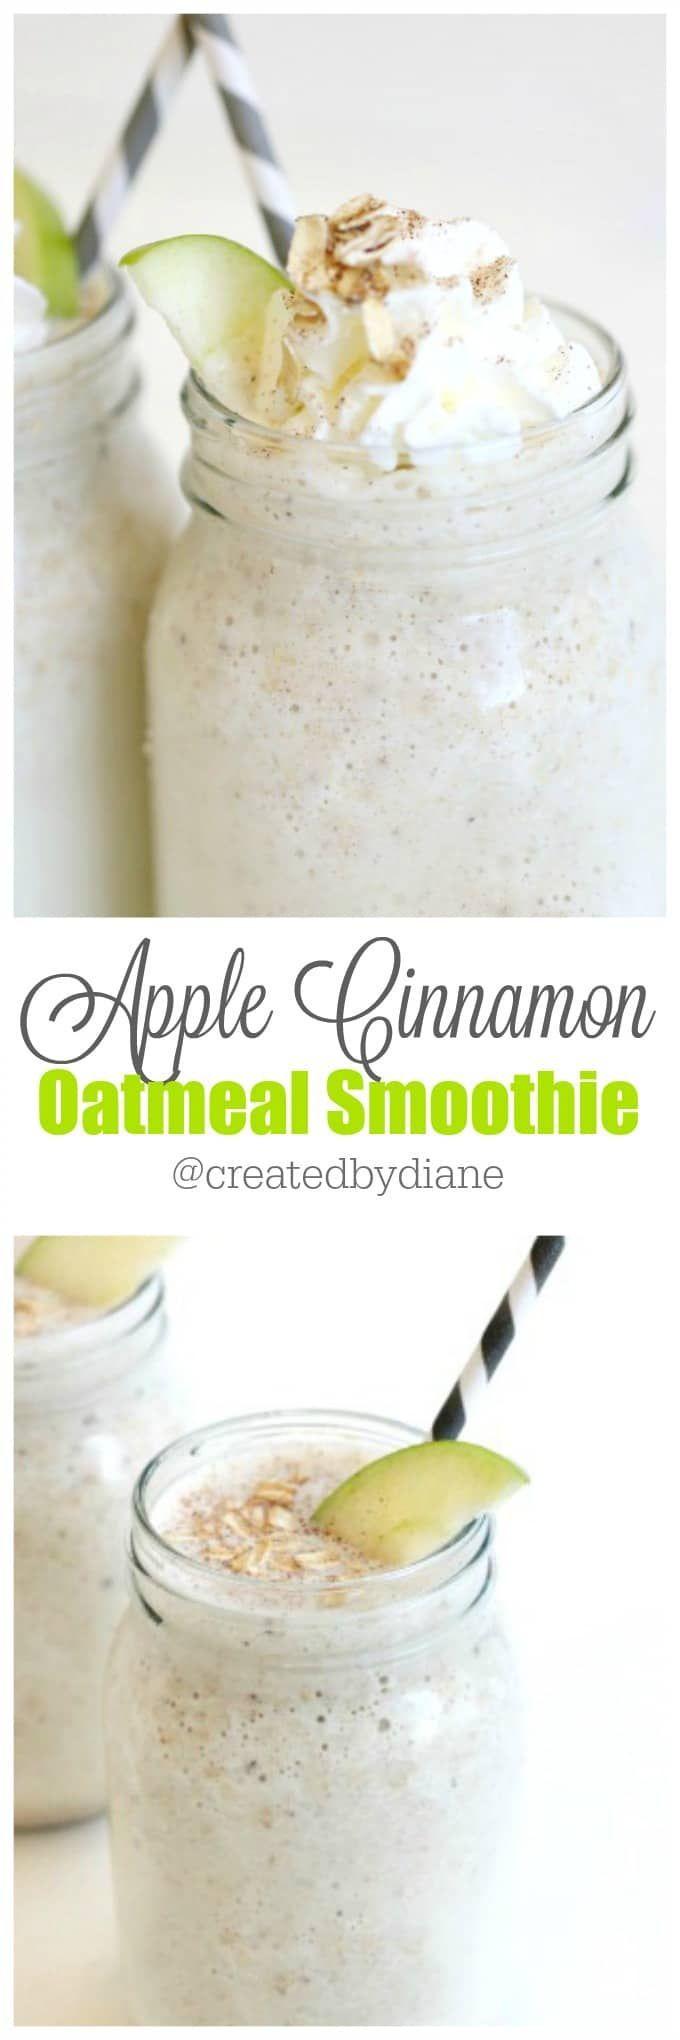 apple cinnamon oatmeal smoothie from www.createdby-diane.com @createdbydiane